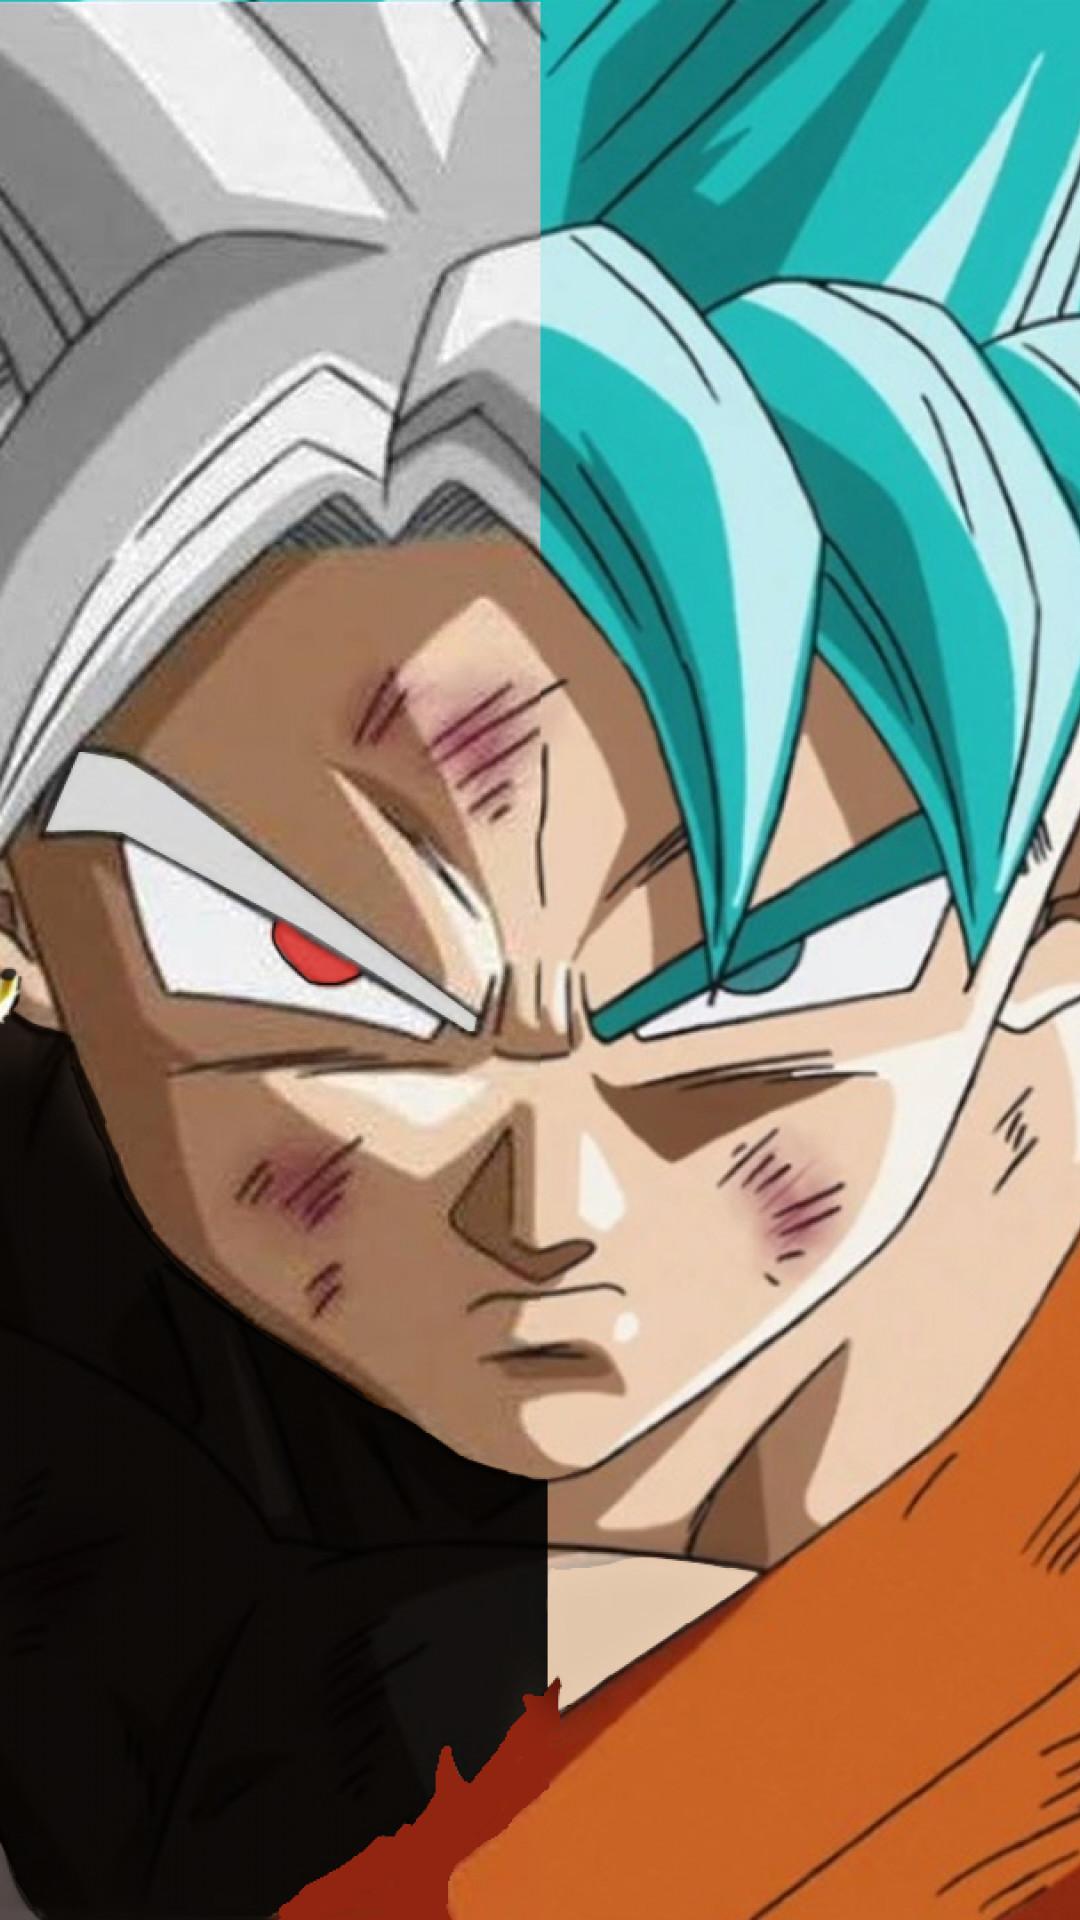 Res: 1080x1920, Black Goku and Son Goku - iPhone 6 Plus